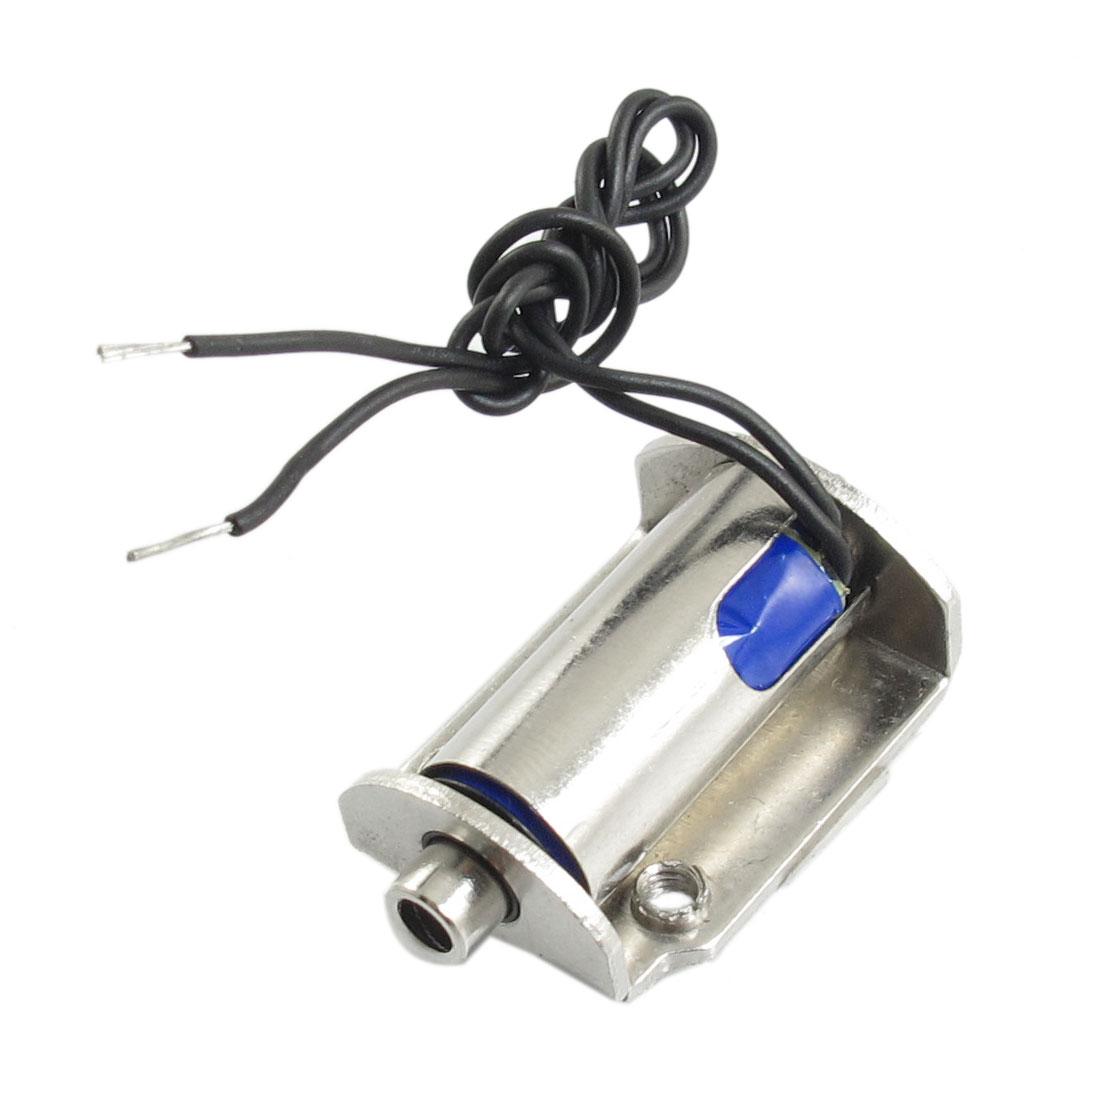 DC 6V 4mm Stroke 2.1W Push Type Solenoid Electromagnet